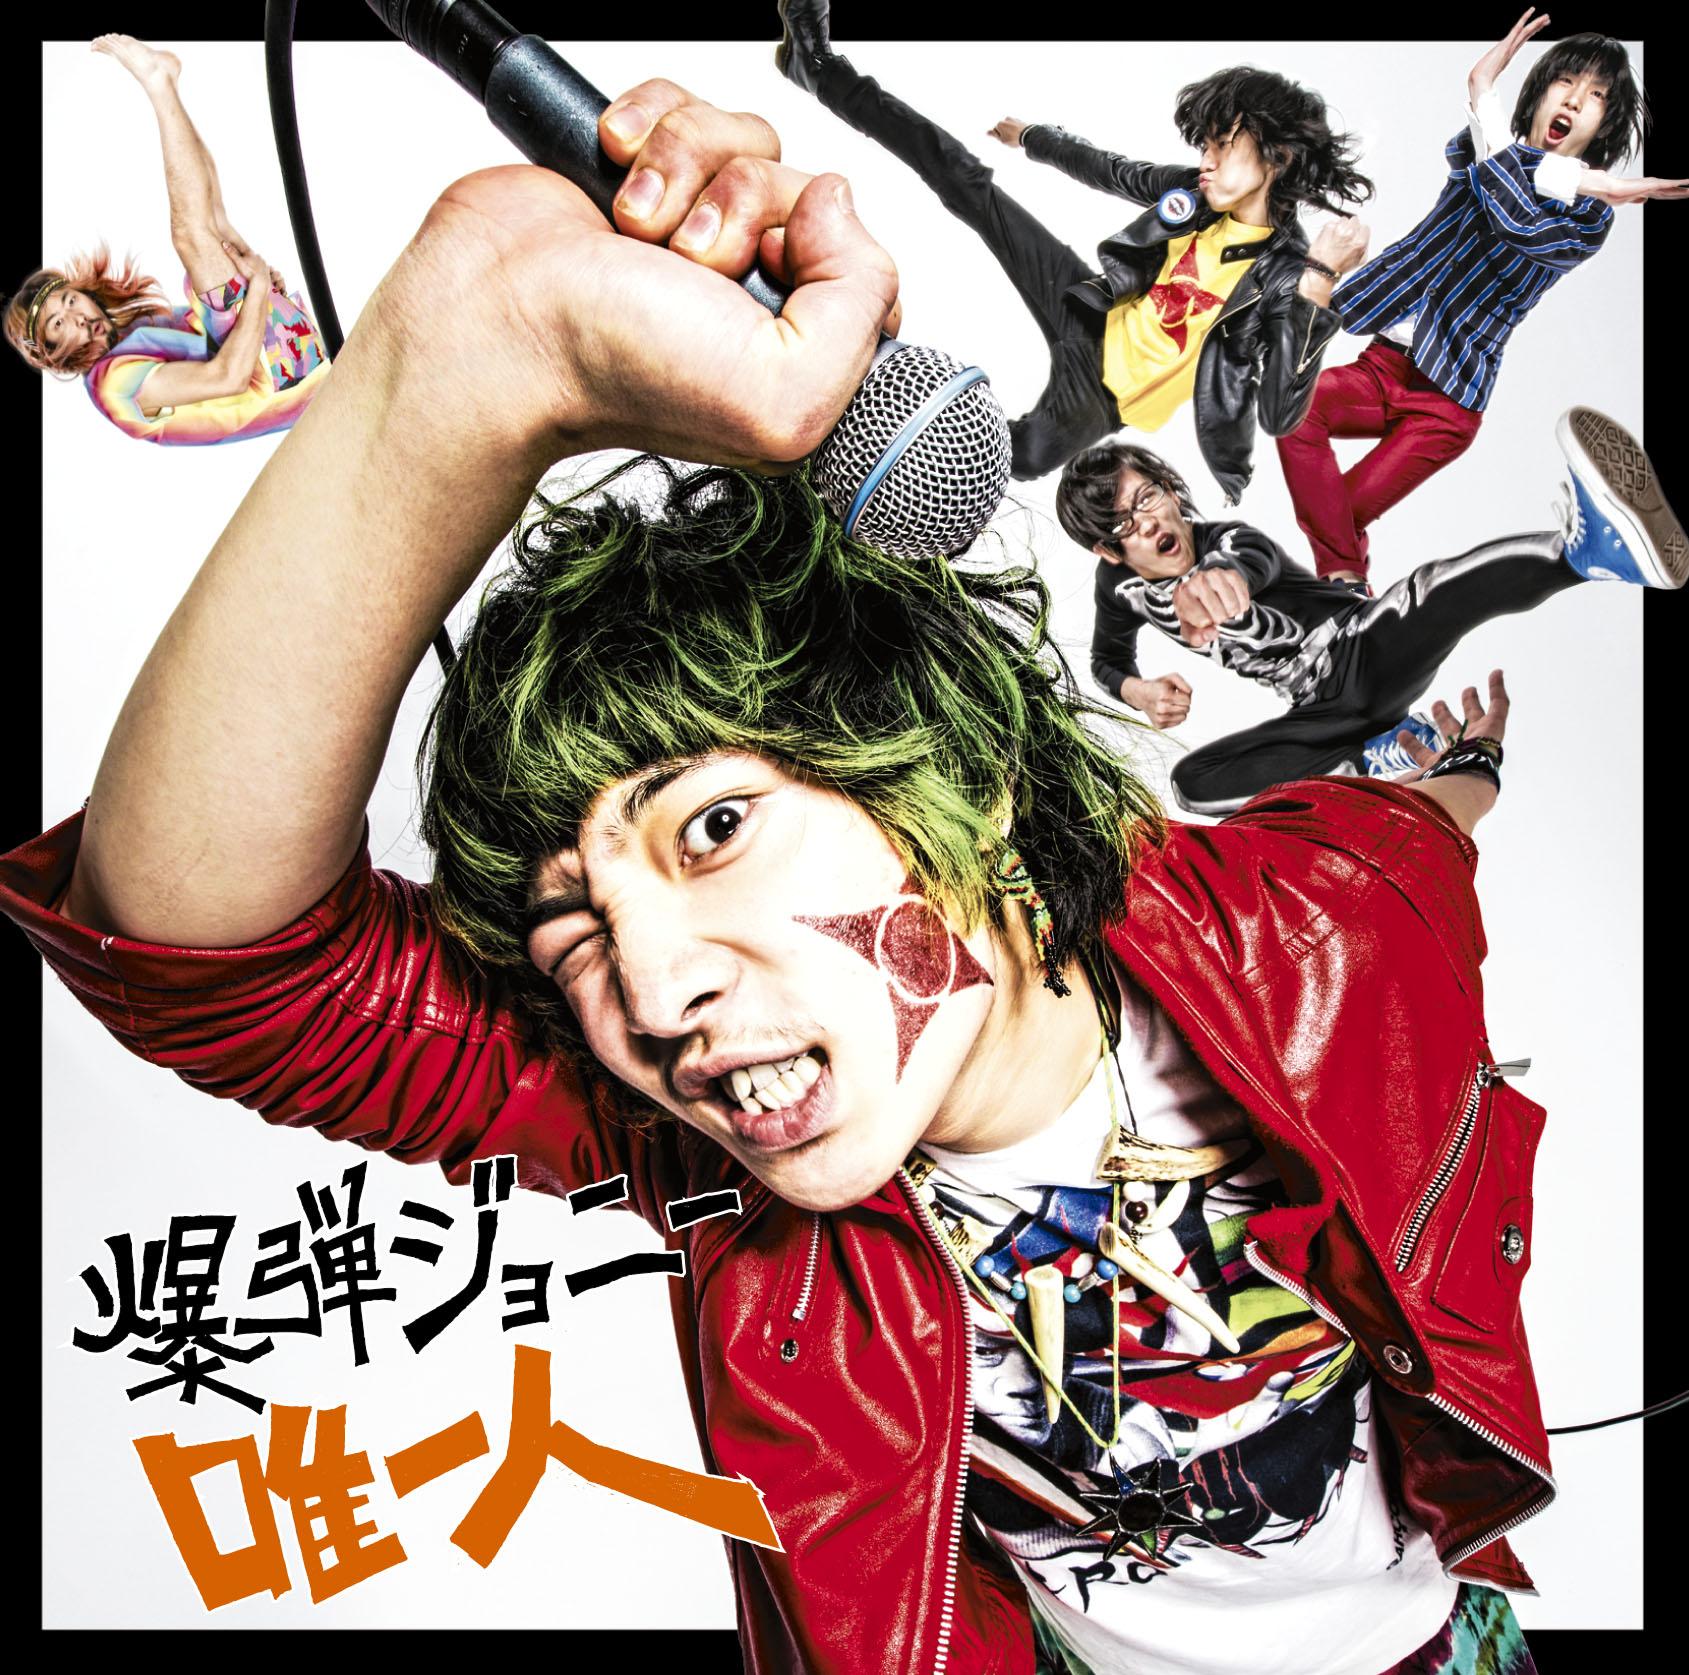 20151206.06.03 Bakudan Johnny - Tada Hitori cover 1.jpg